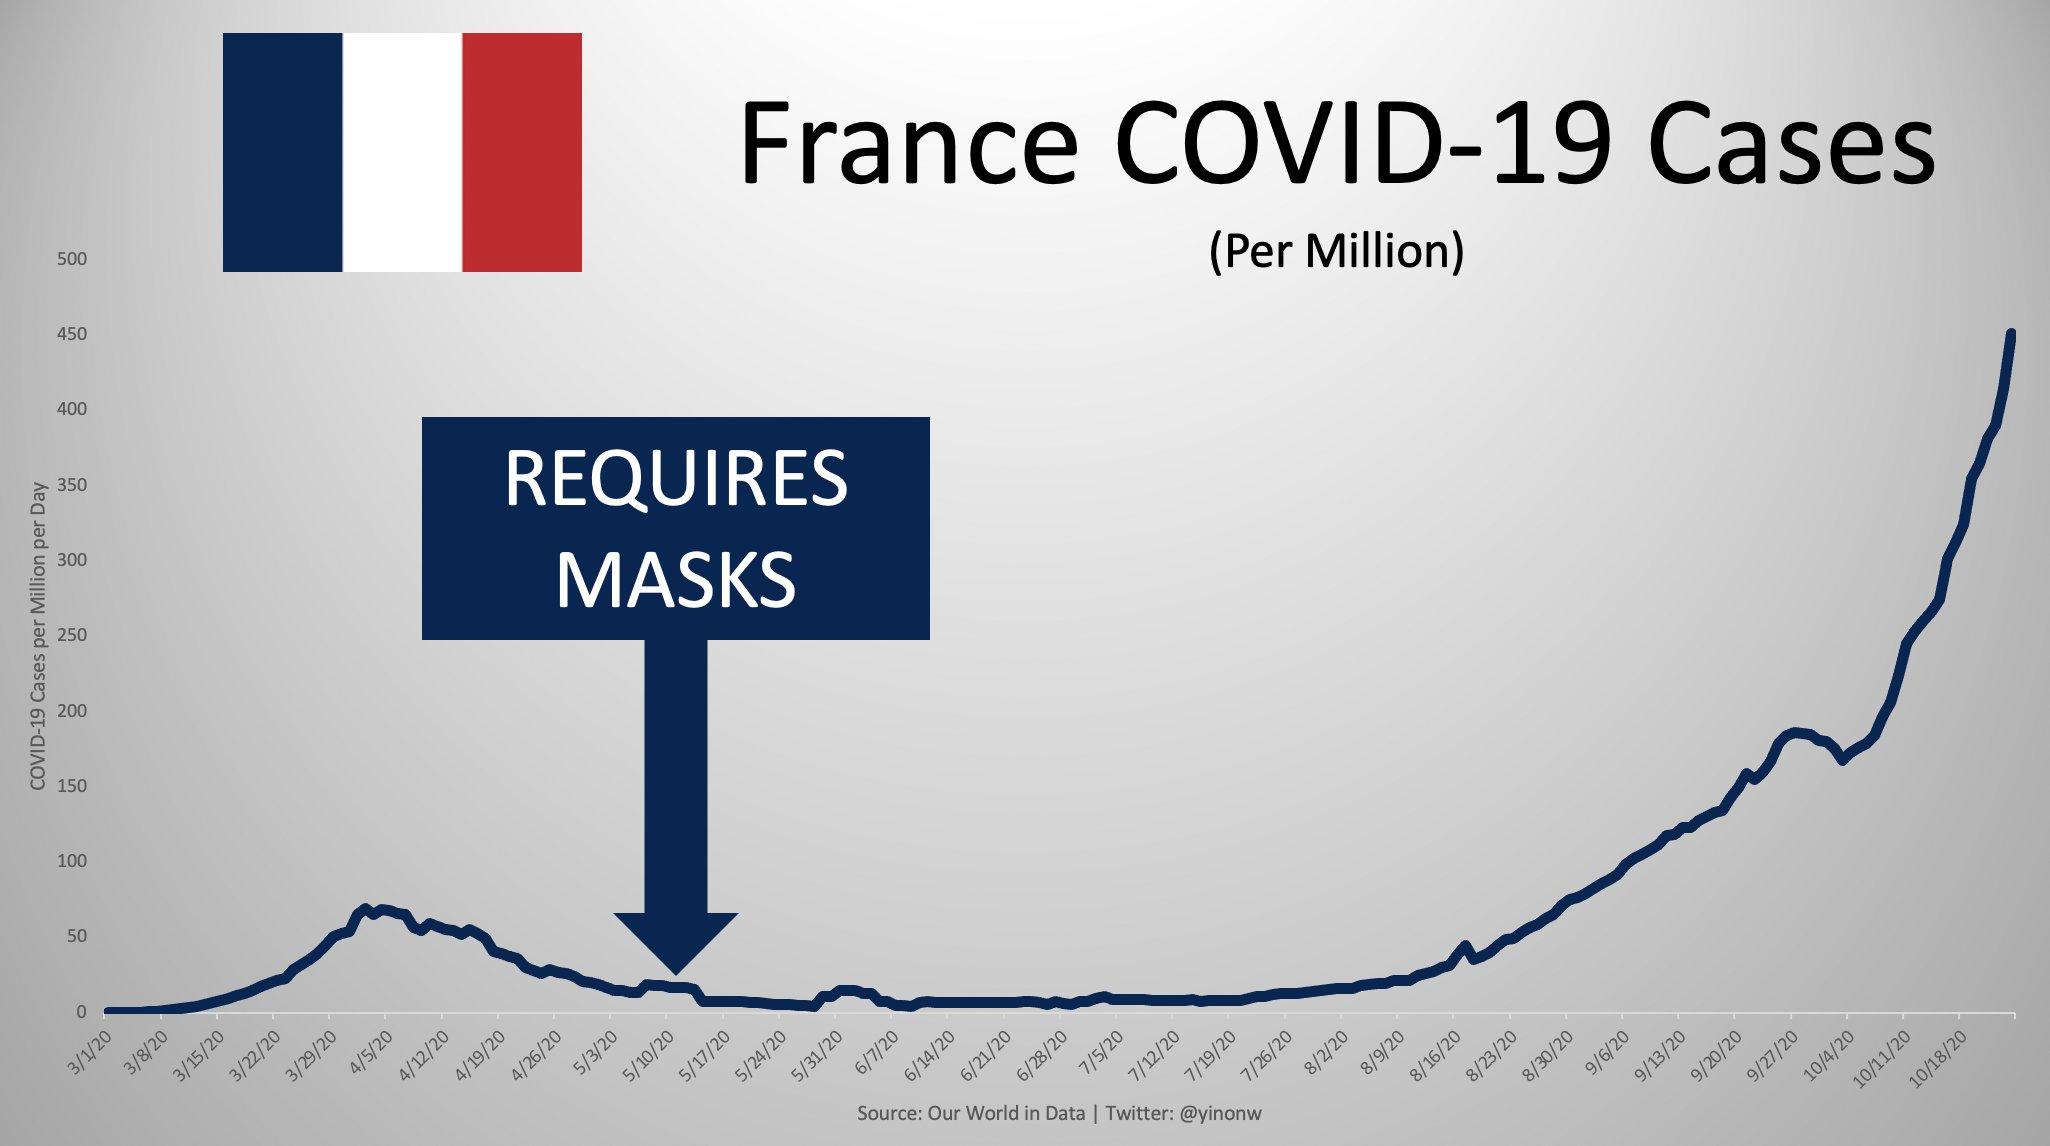 Are Face Masks Effective? The Evidence. Masks-france-1